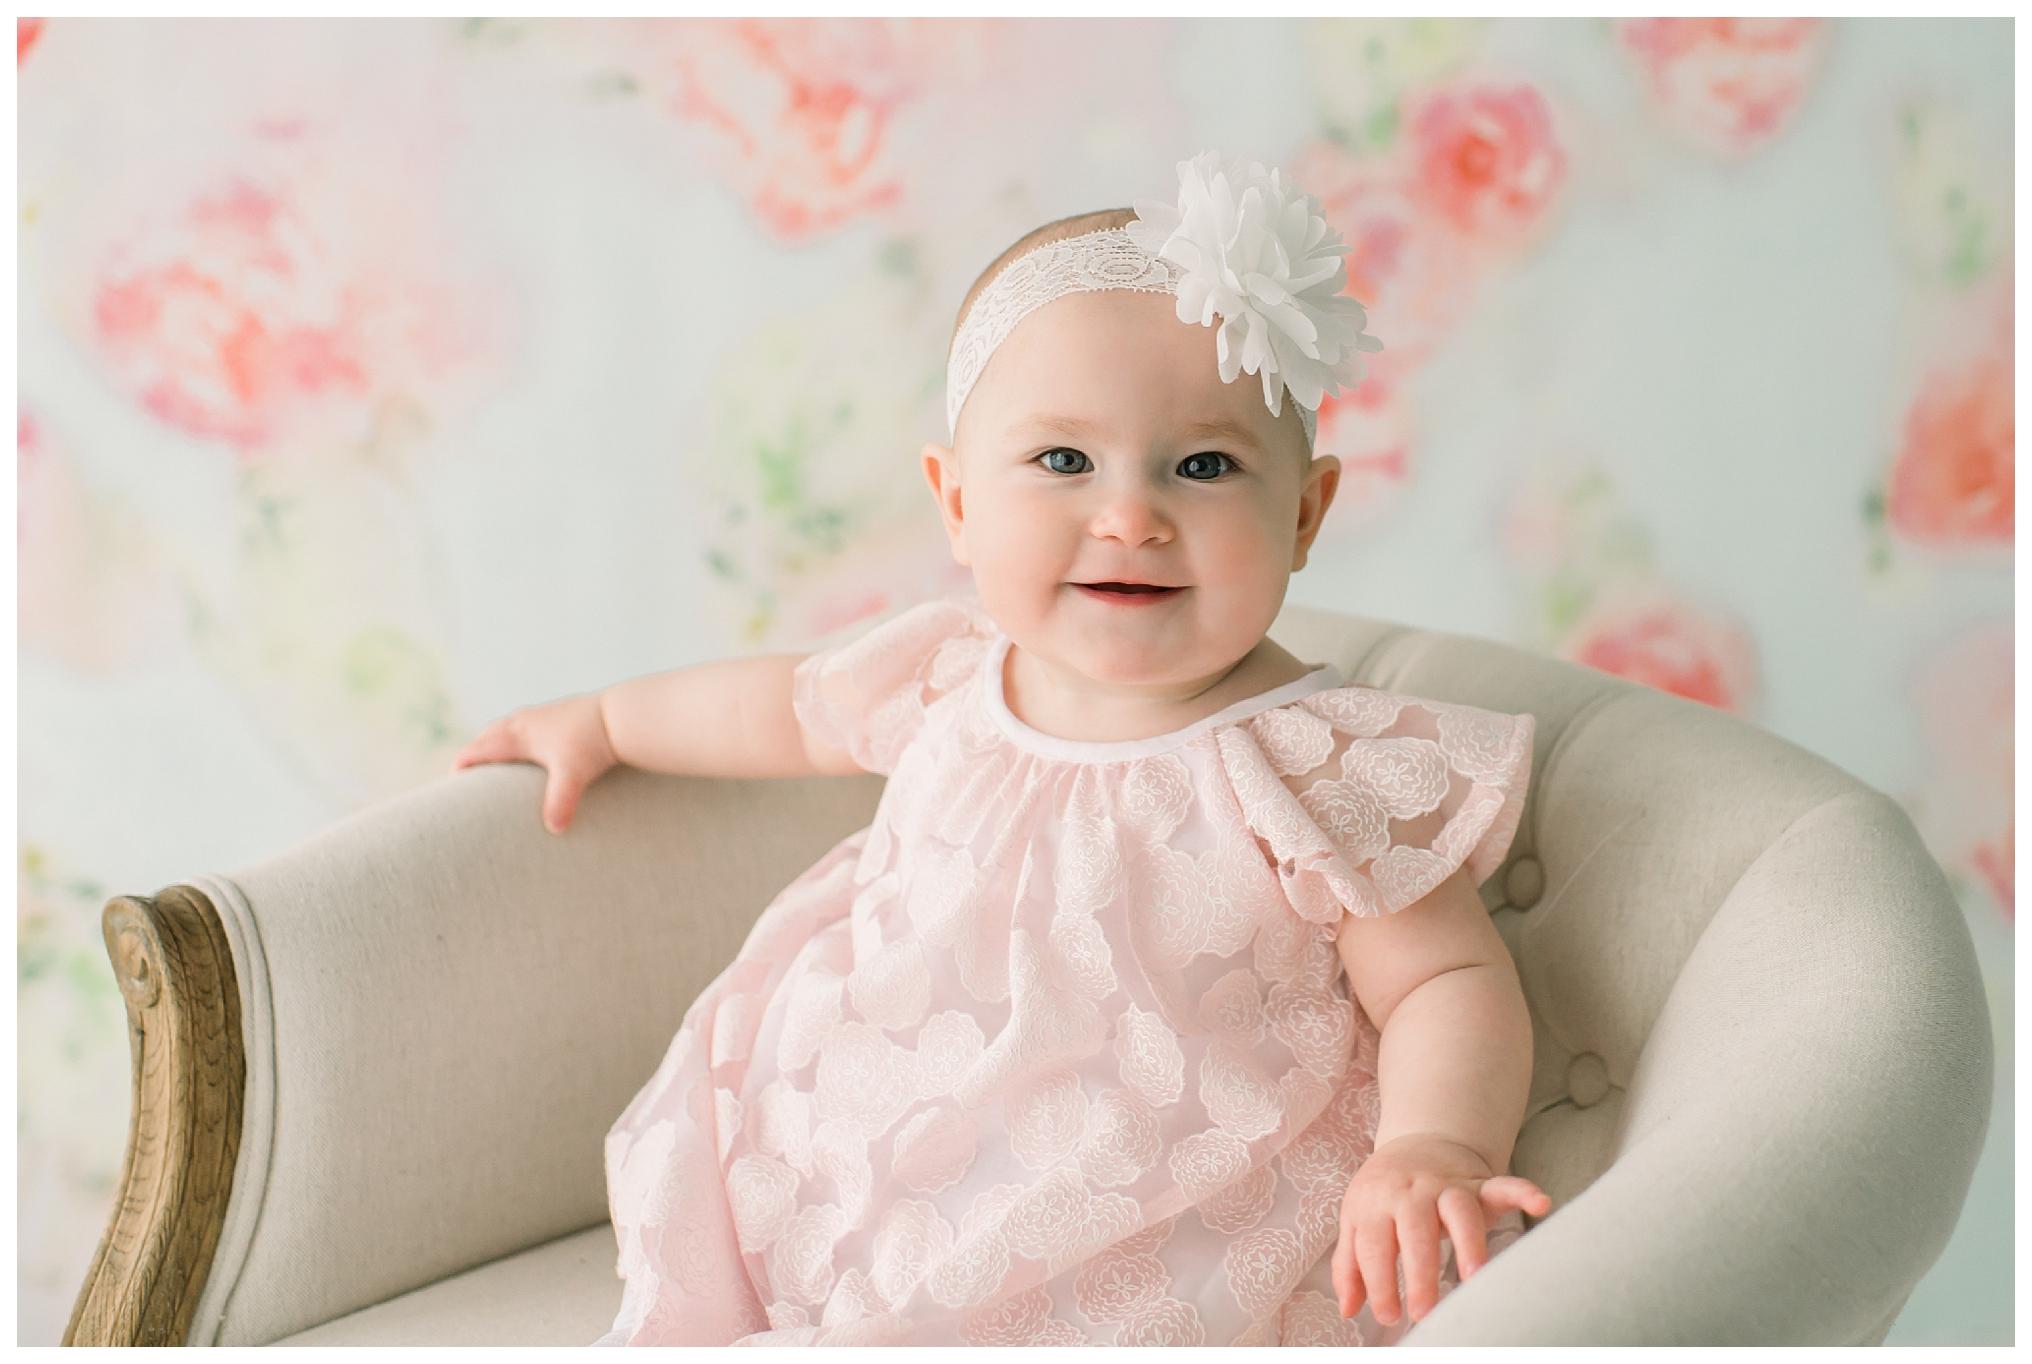 Maine-baby-photographer-sweet-light-portraits237.jpg